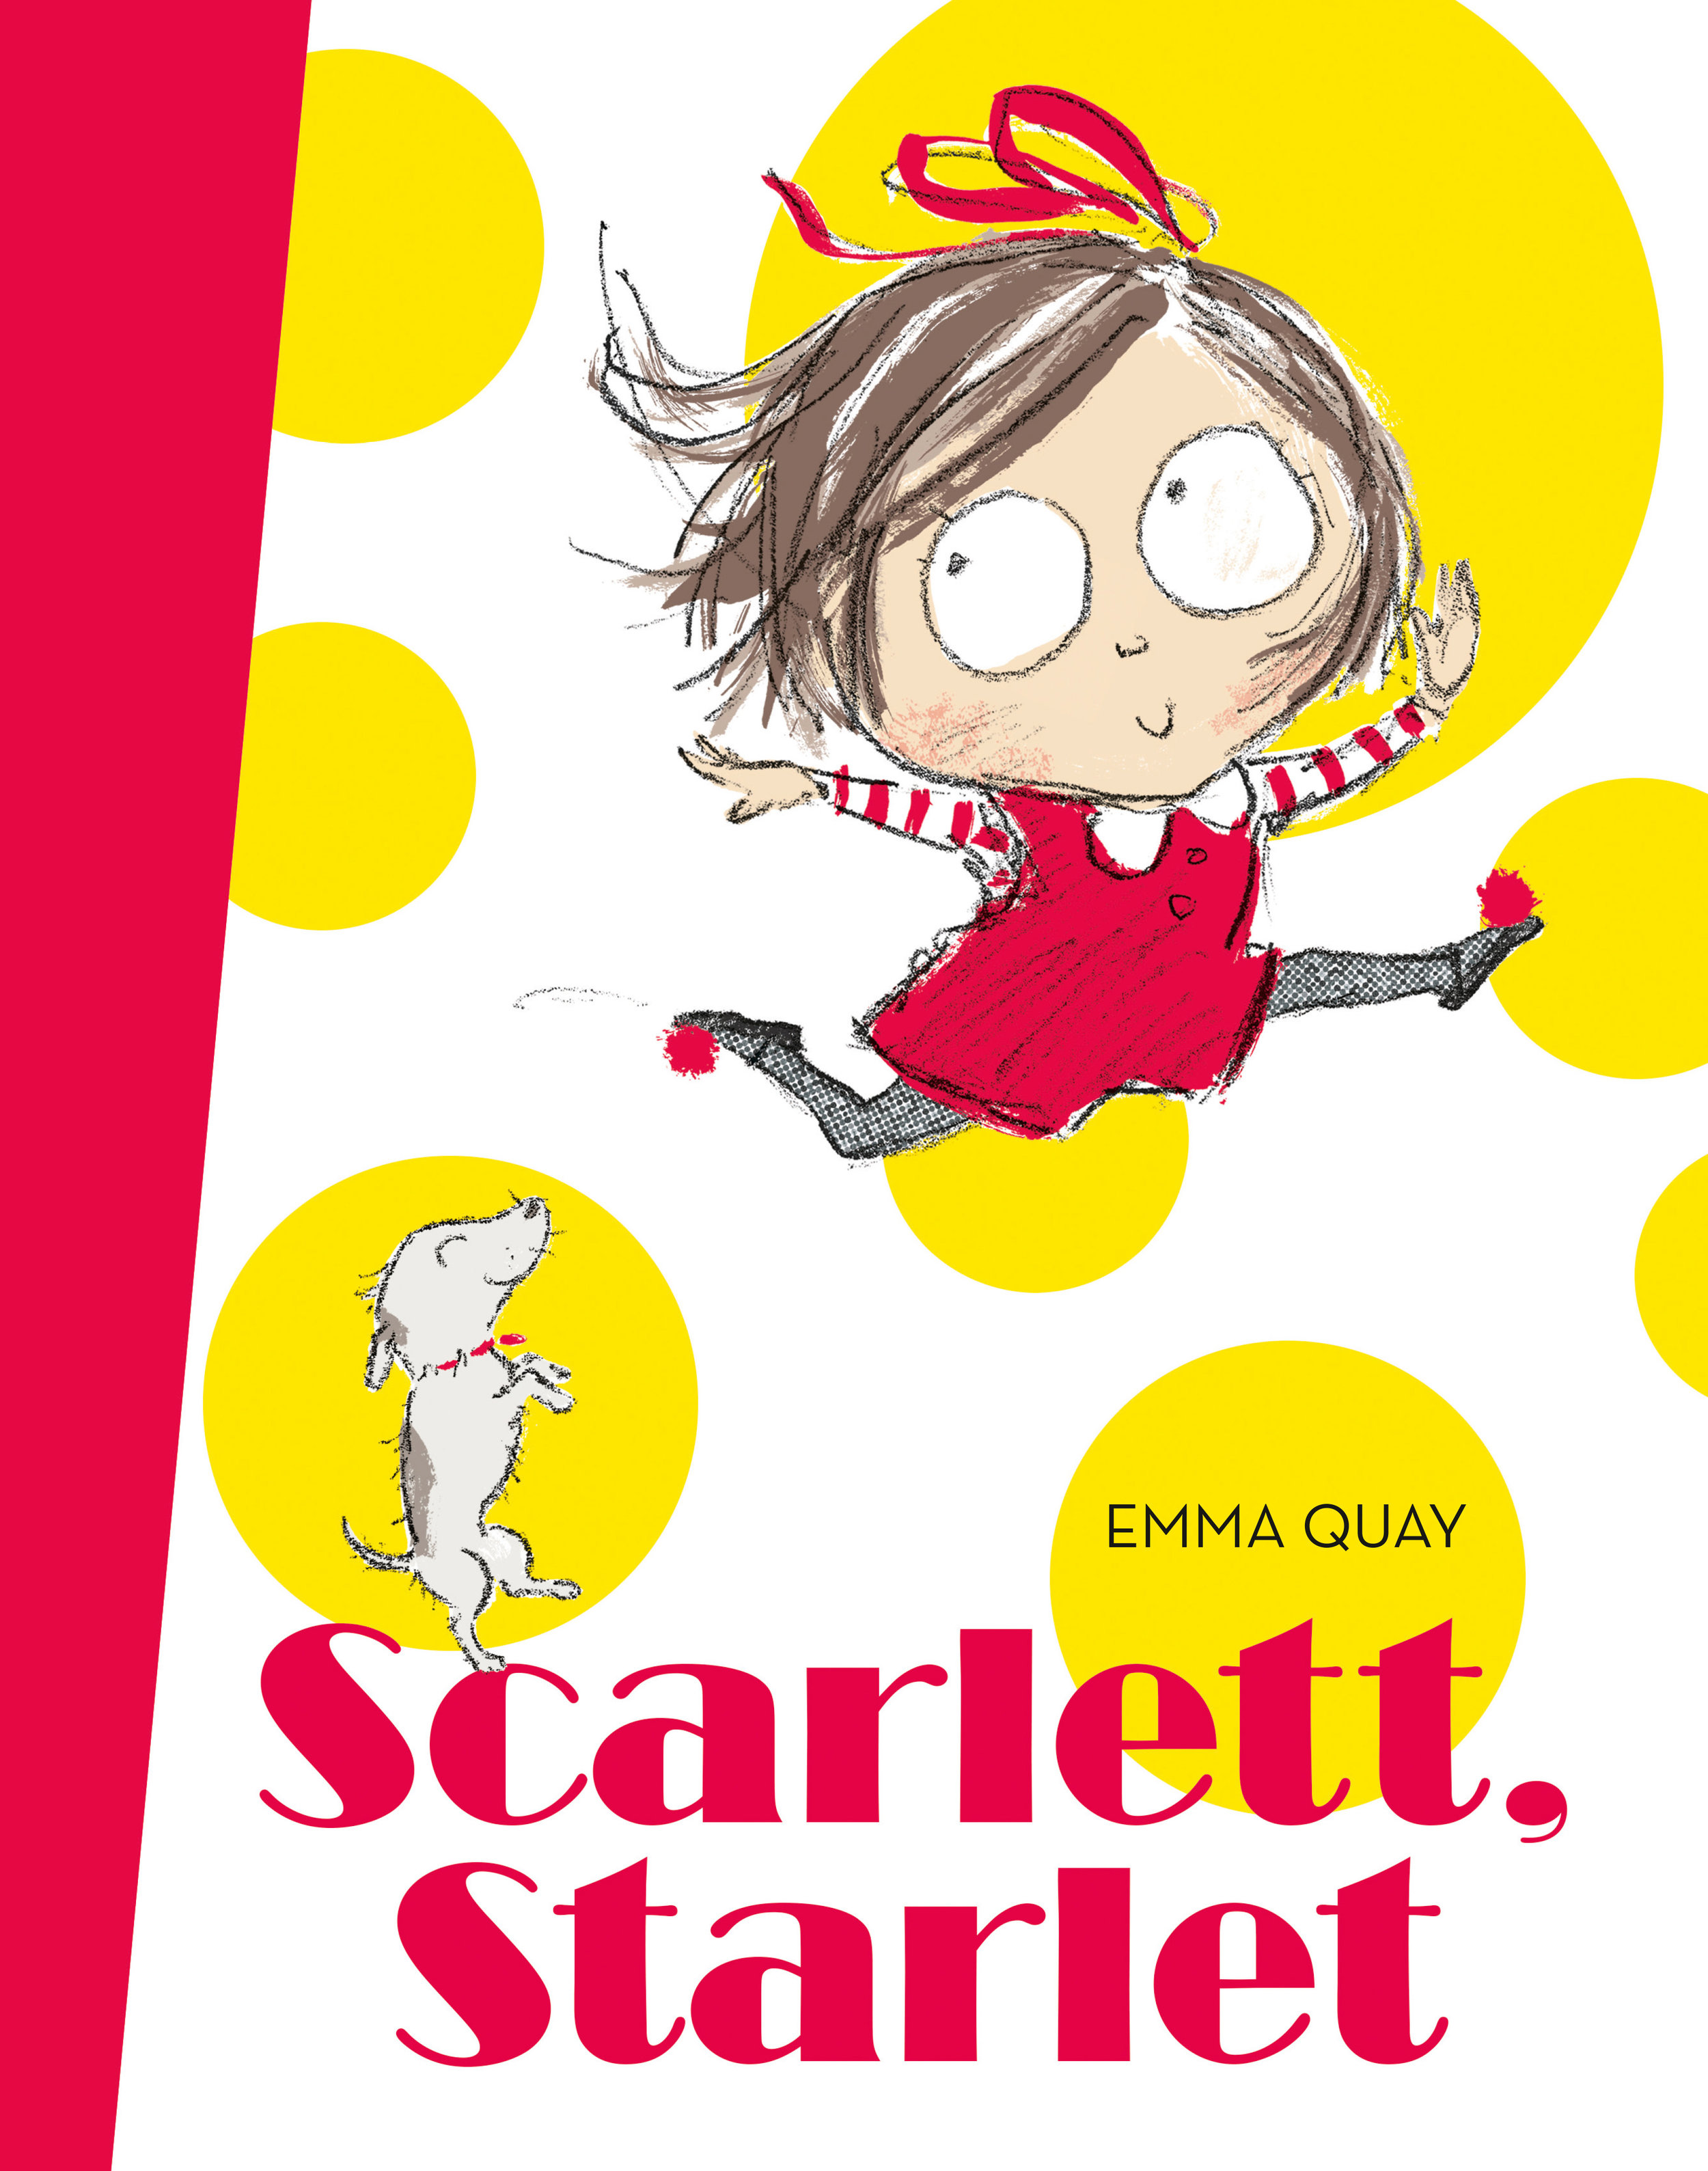 SCARLETT, STARLET by Emma Quay (ABC Books) - www.emmaquay.com